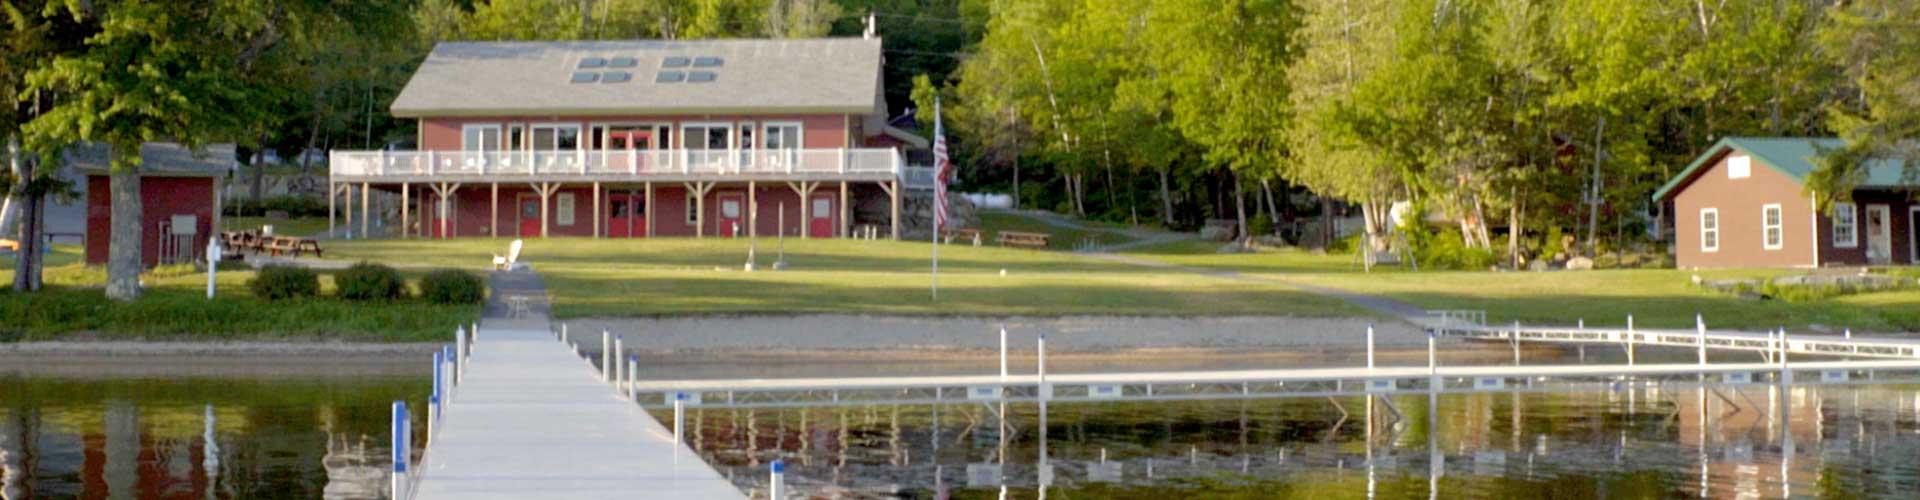 Maine summer camp Camp Alsing